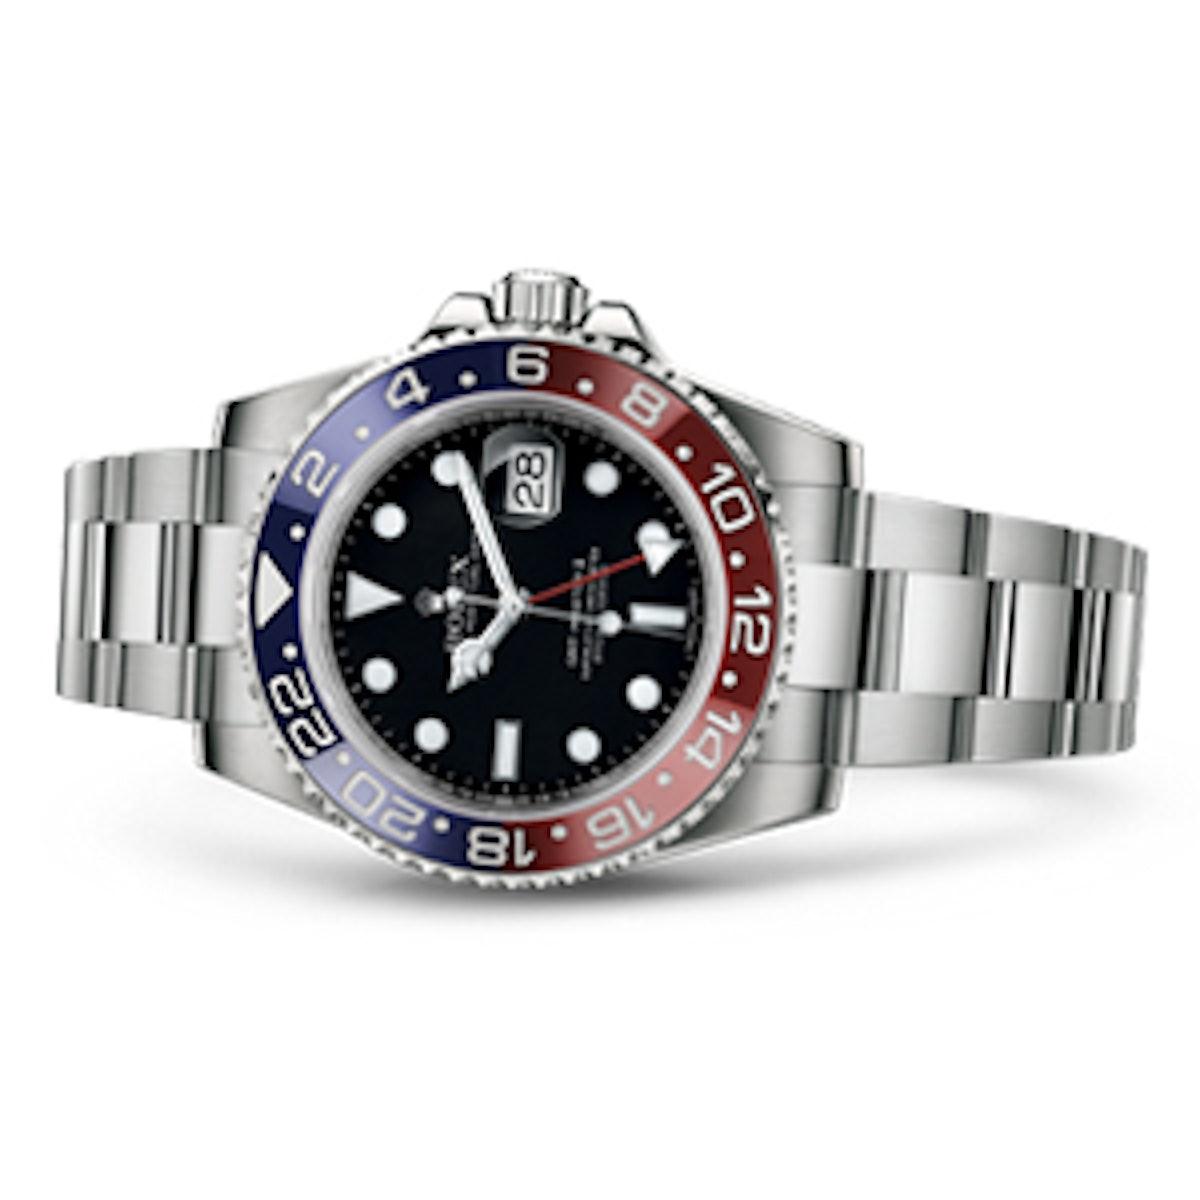 GMT Master II White Gold Watch